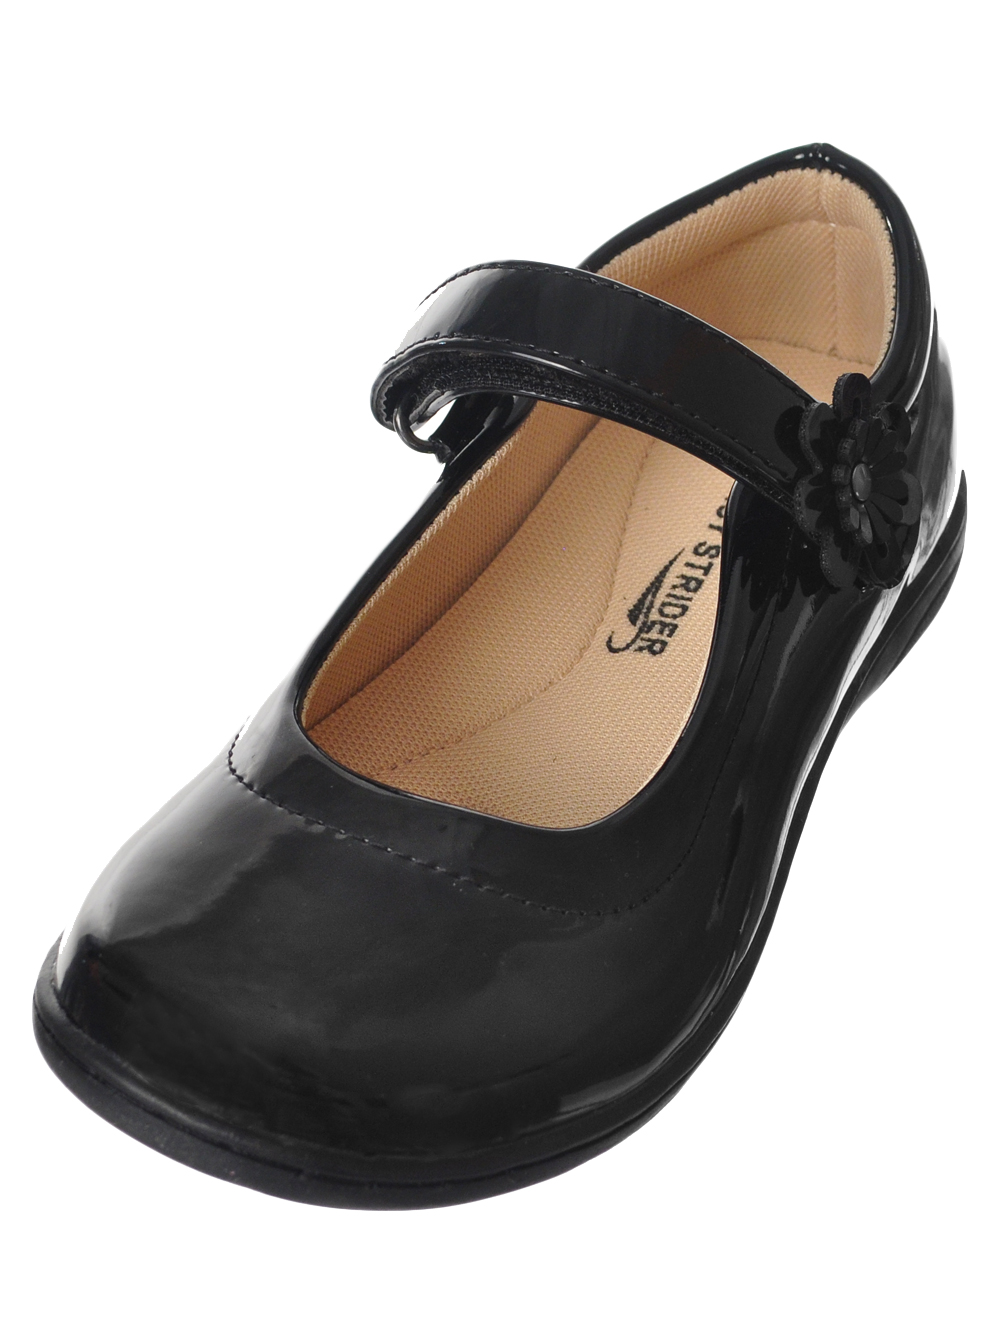 ec0a8c5fa7285 Girls' Mary Jane Shoes (Sizes 7 - 8)